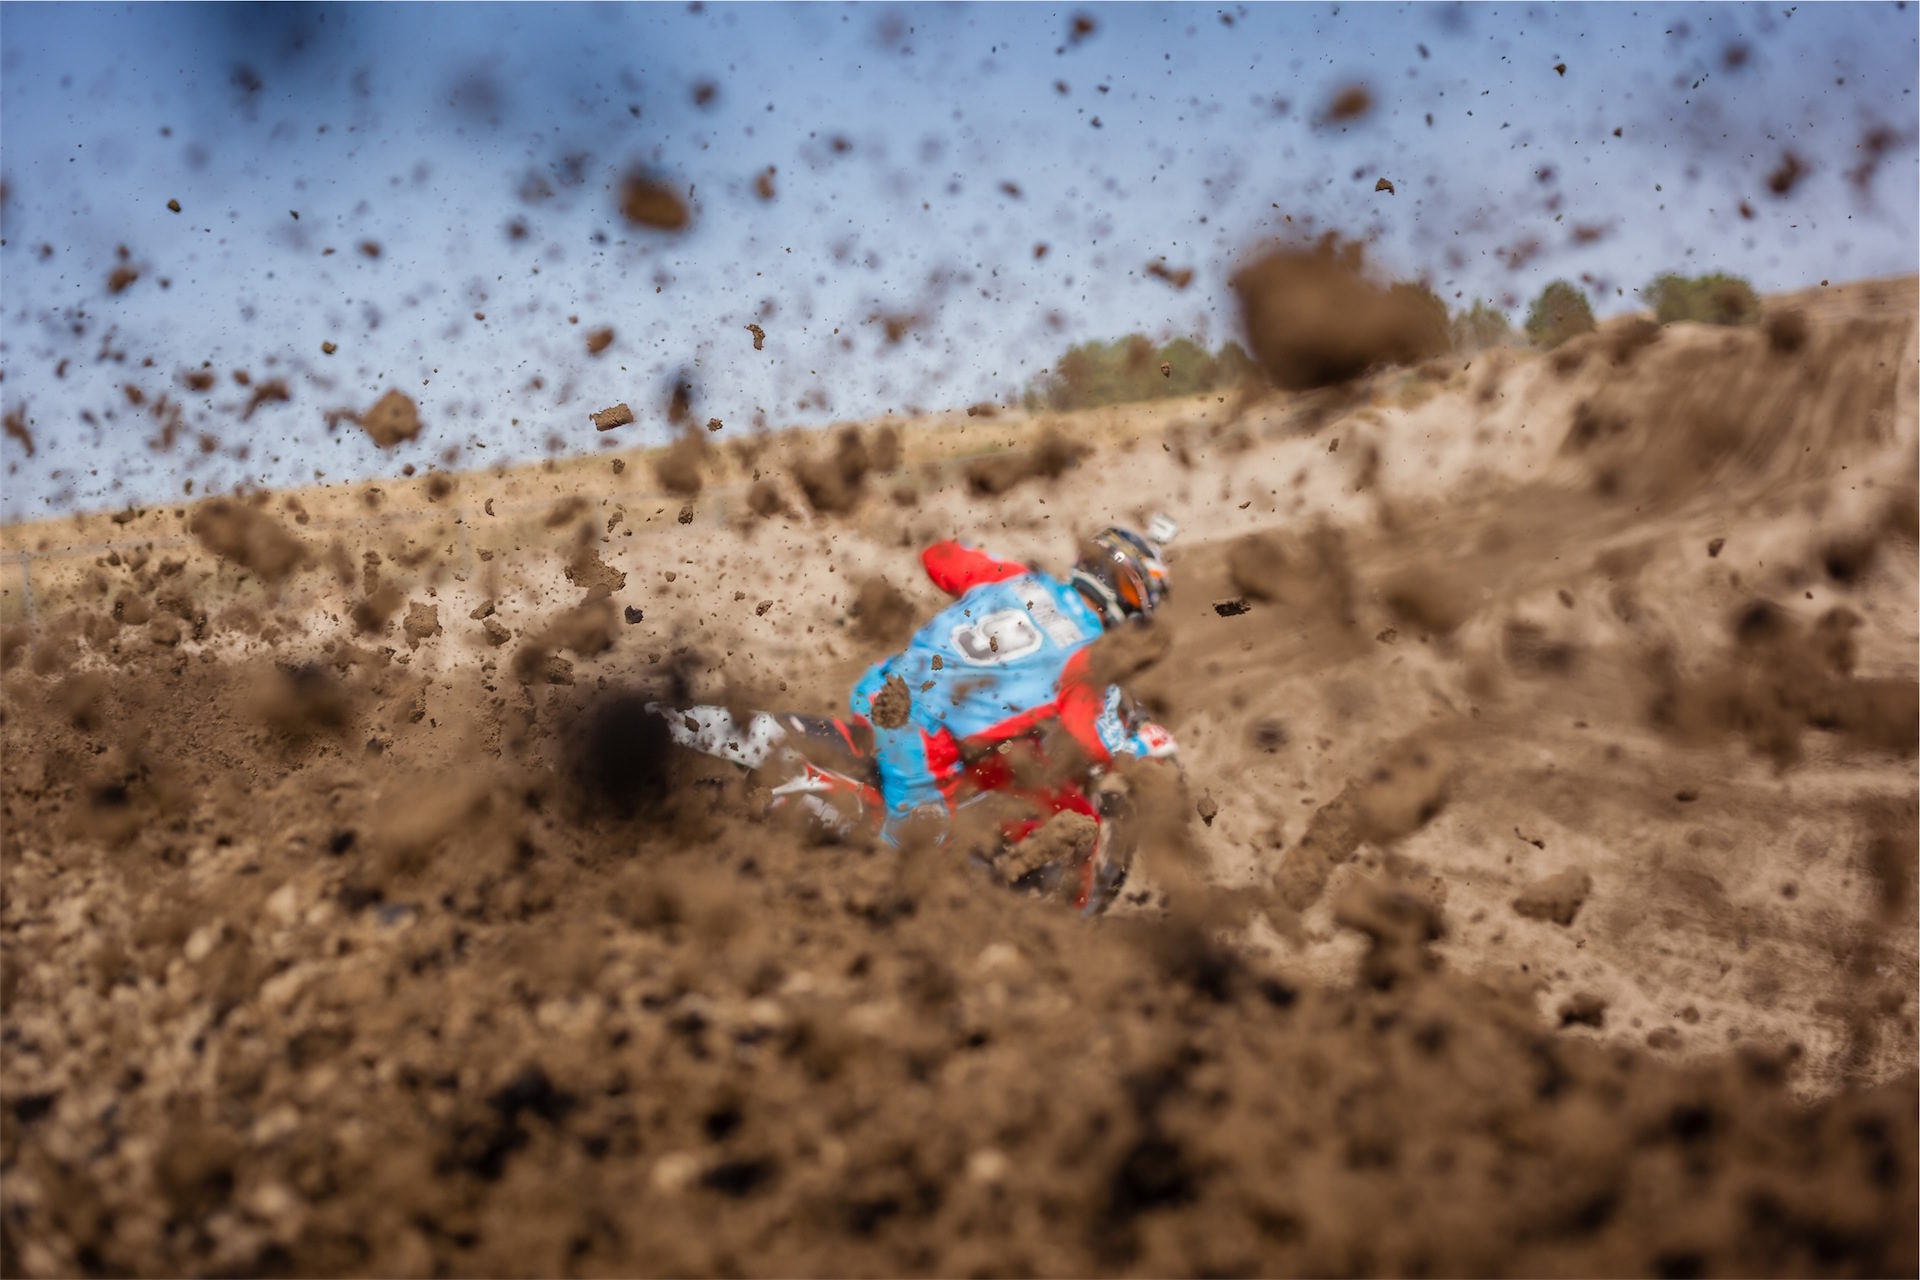 Motocross, moto, fango, Drift, rischio - Sfondi HD - Professor-falken.com